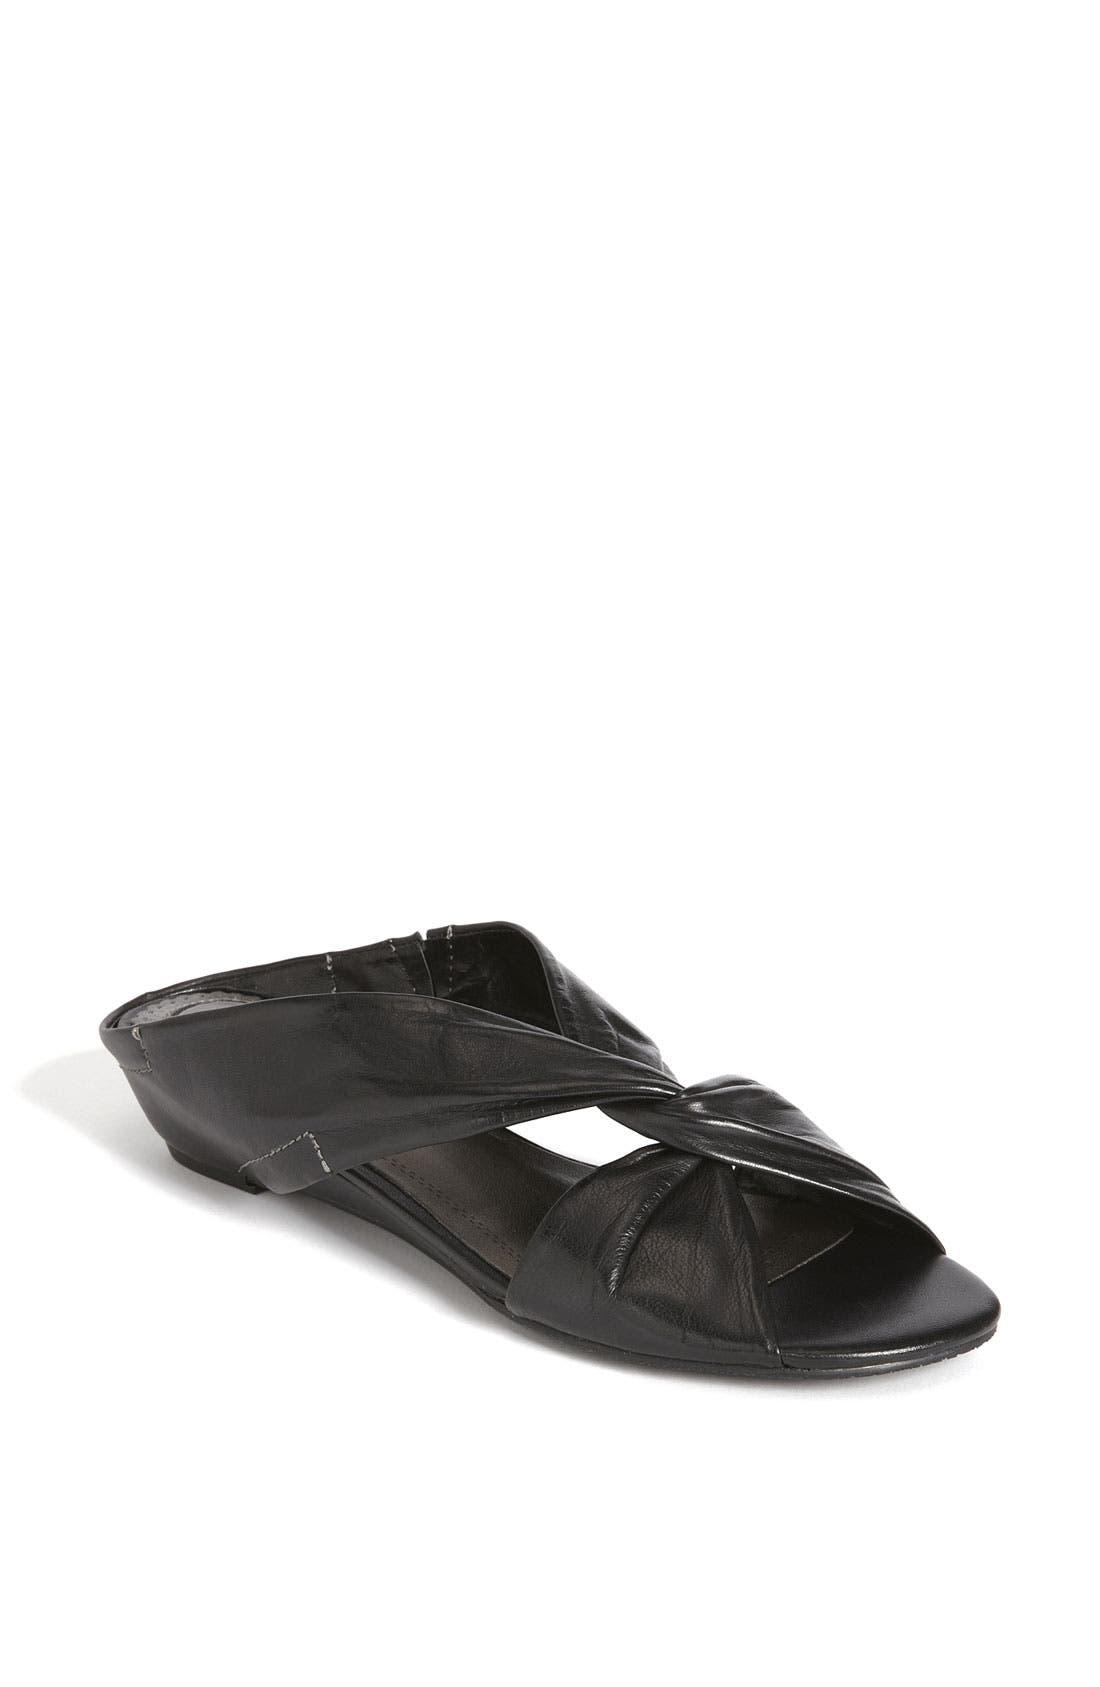 Main Image - Trotters 'Cameron' Sandal